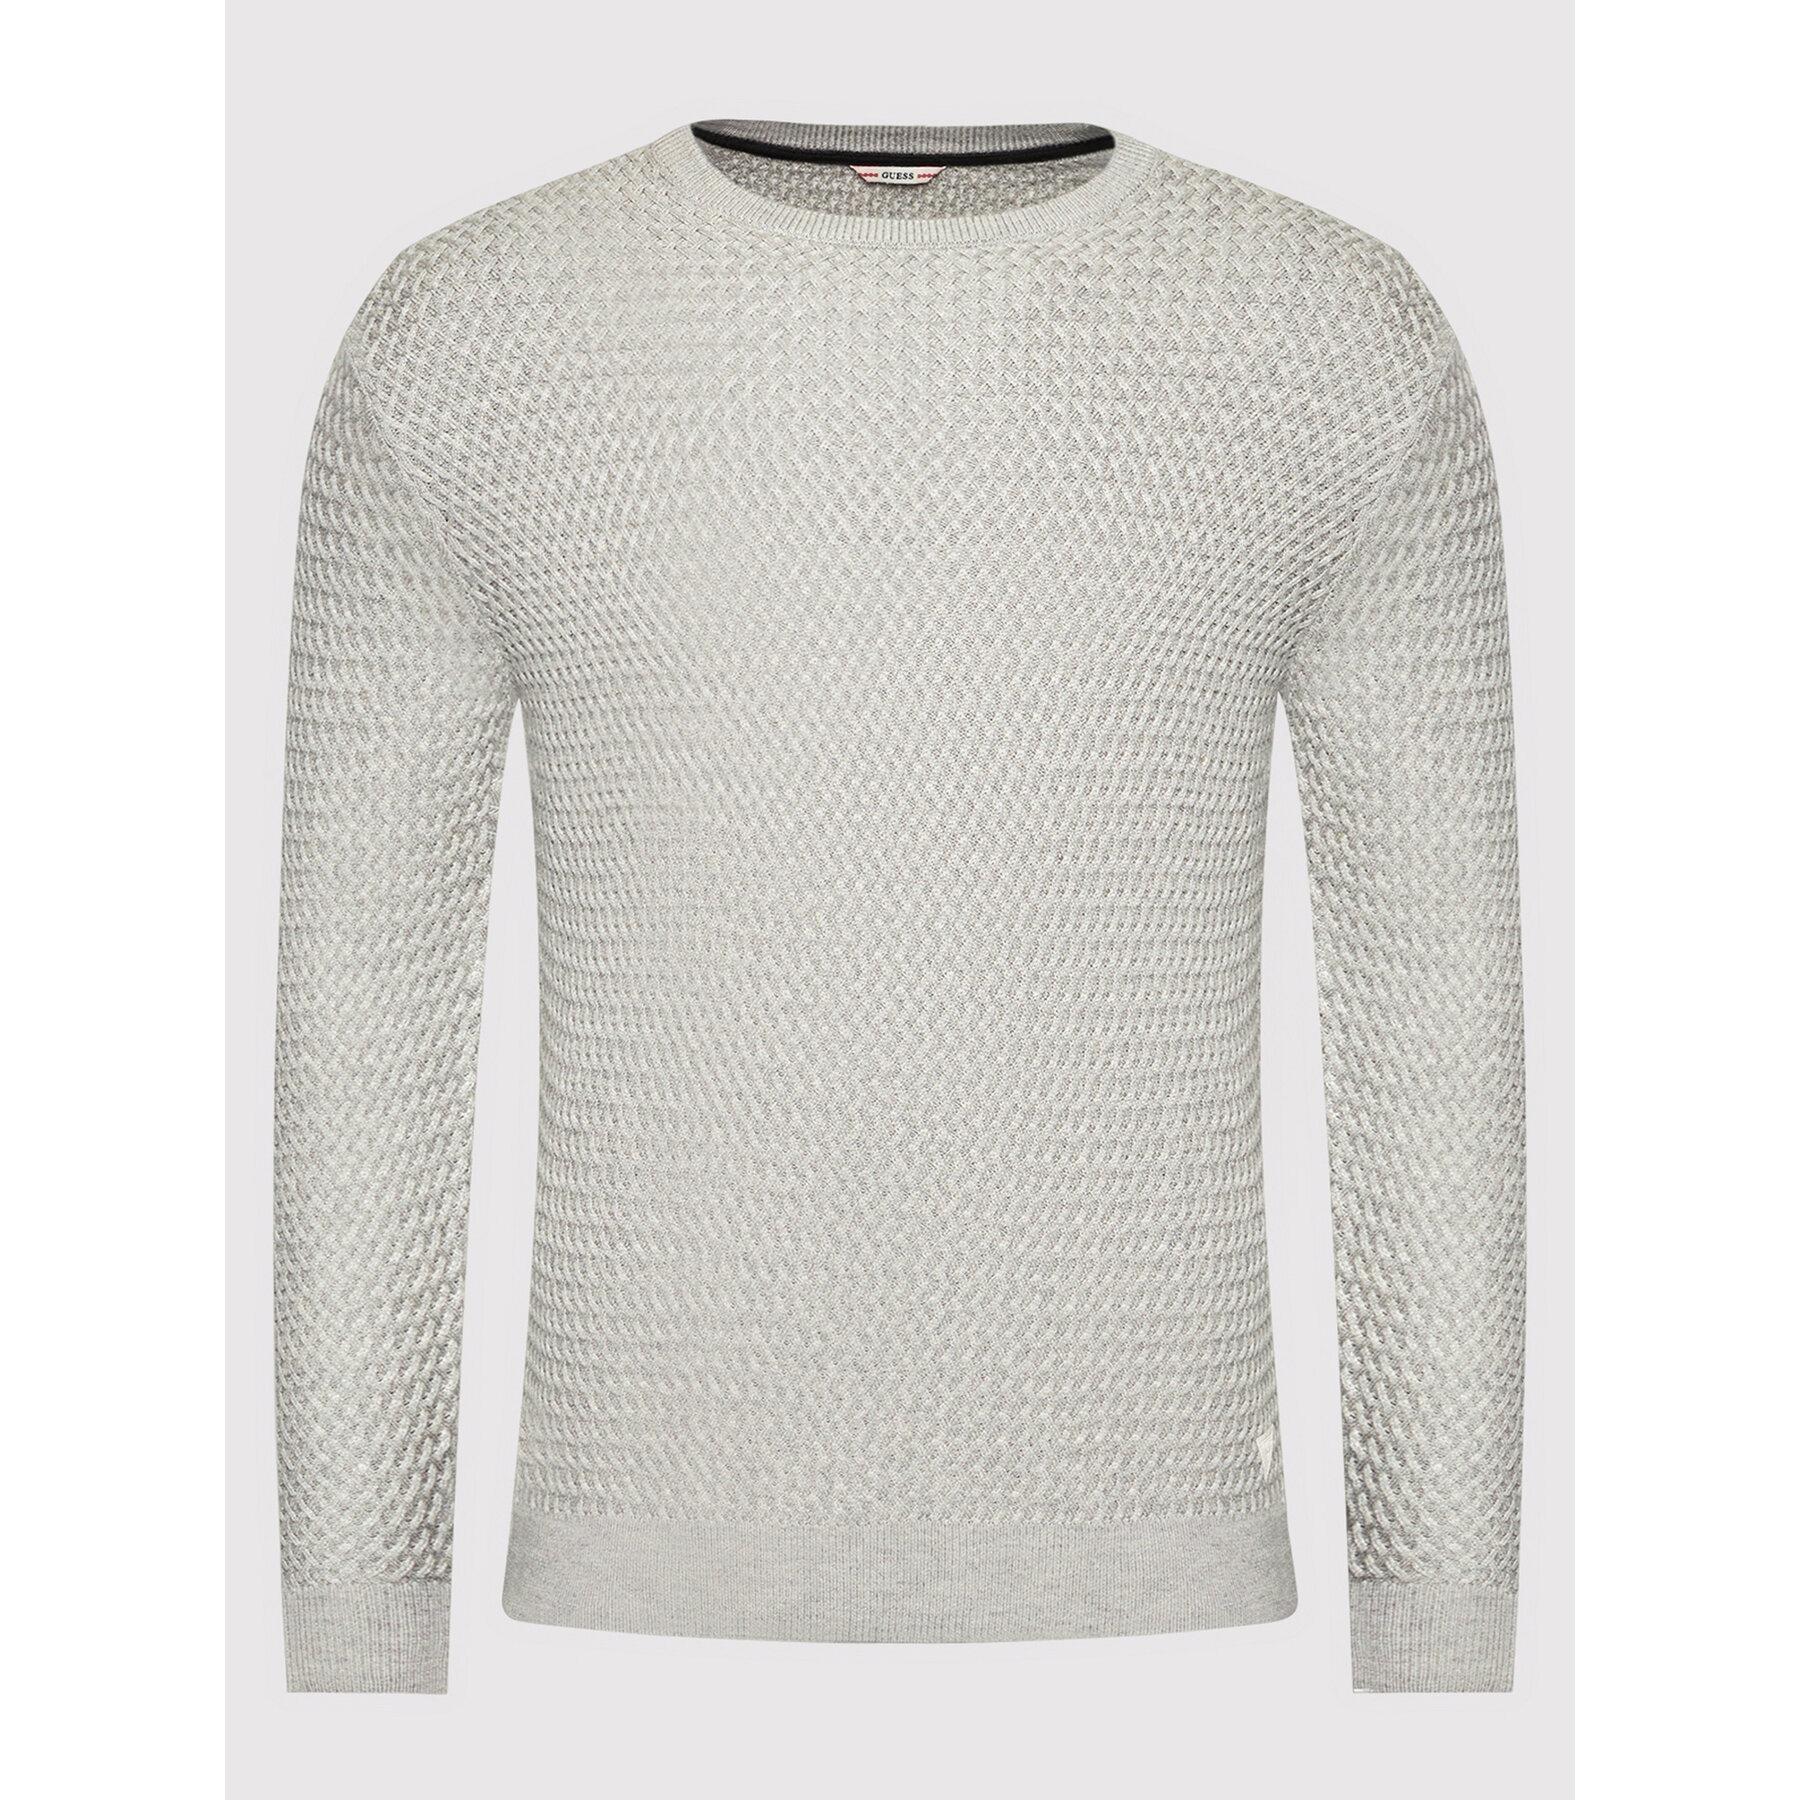 keaton ls cn basket stitch GUESS | Maglie | M1YR60 Z2UY0H9C9